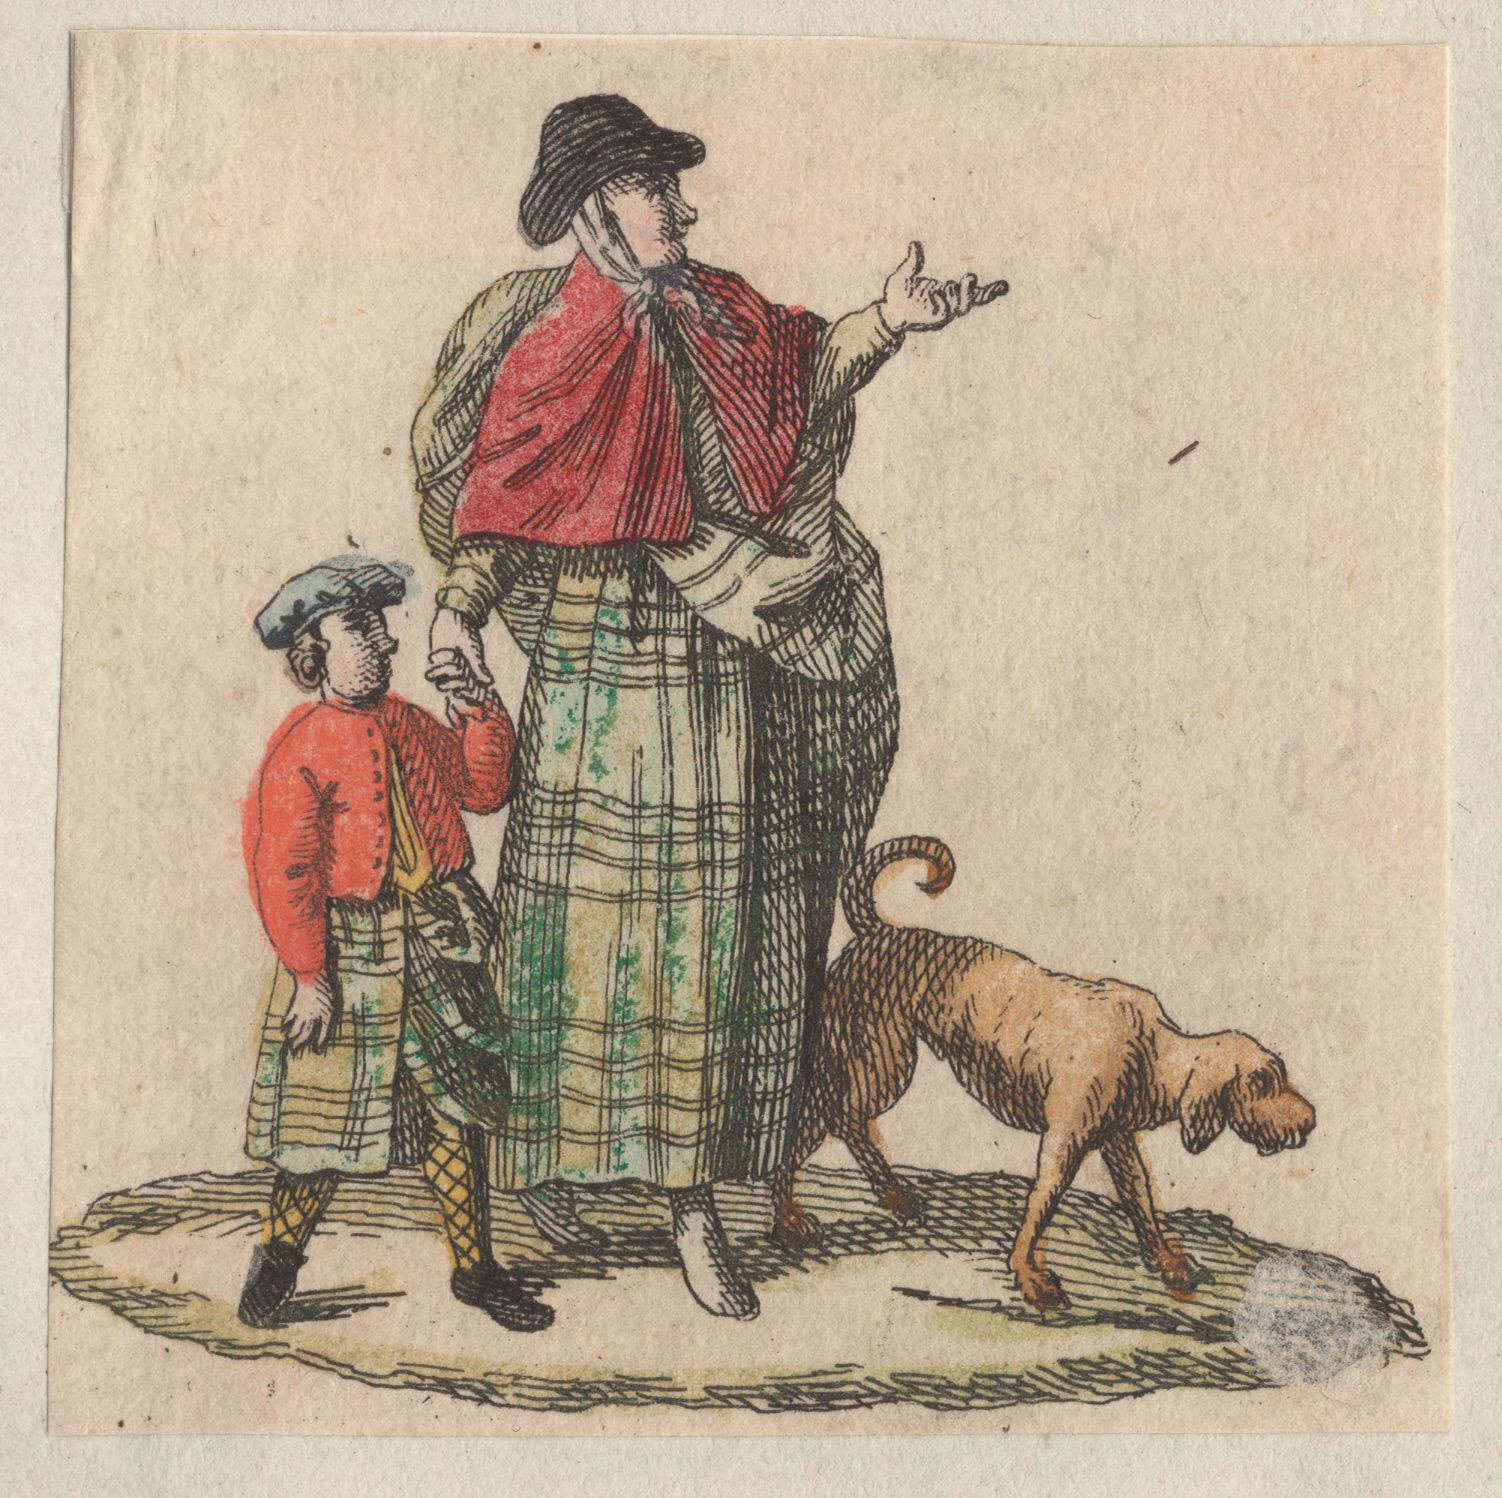 Pin by Rosemary Jones on Women's History - Scottish Women / Hanes Merched yr Alban | Pinterest ...